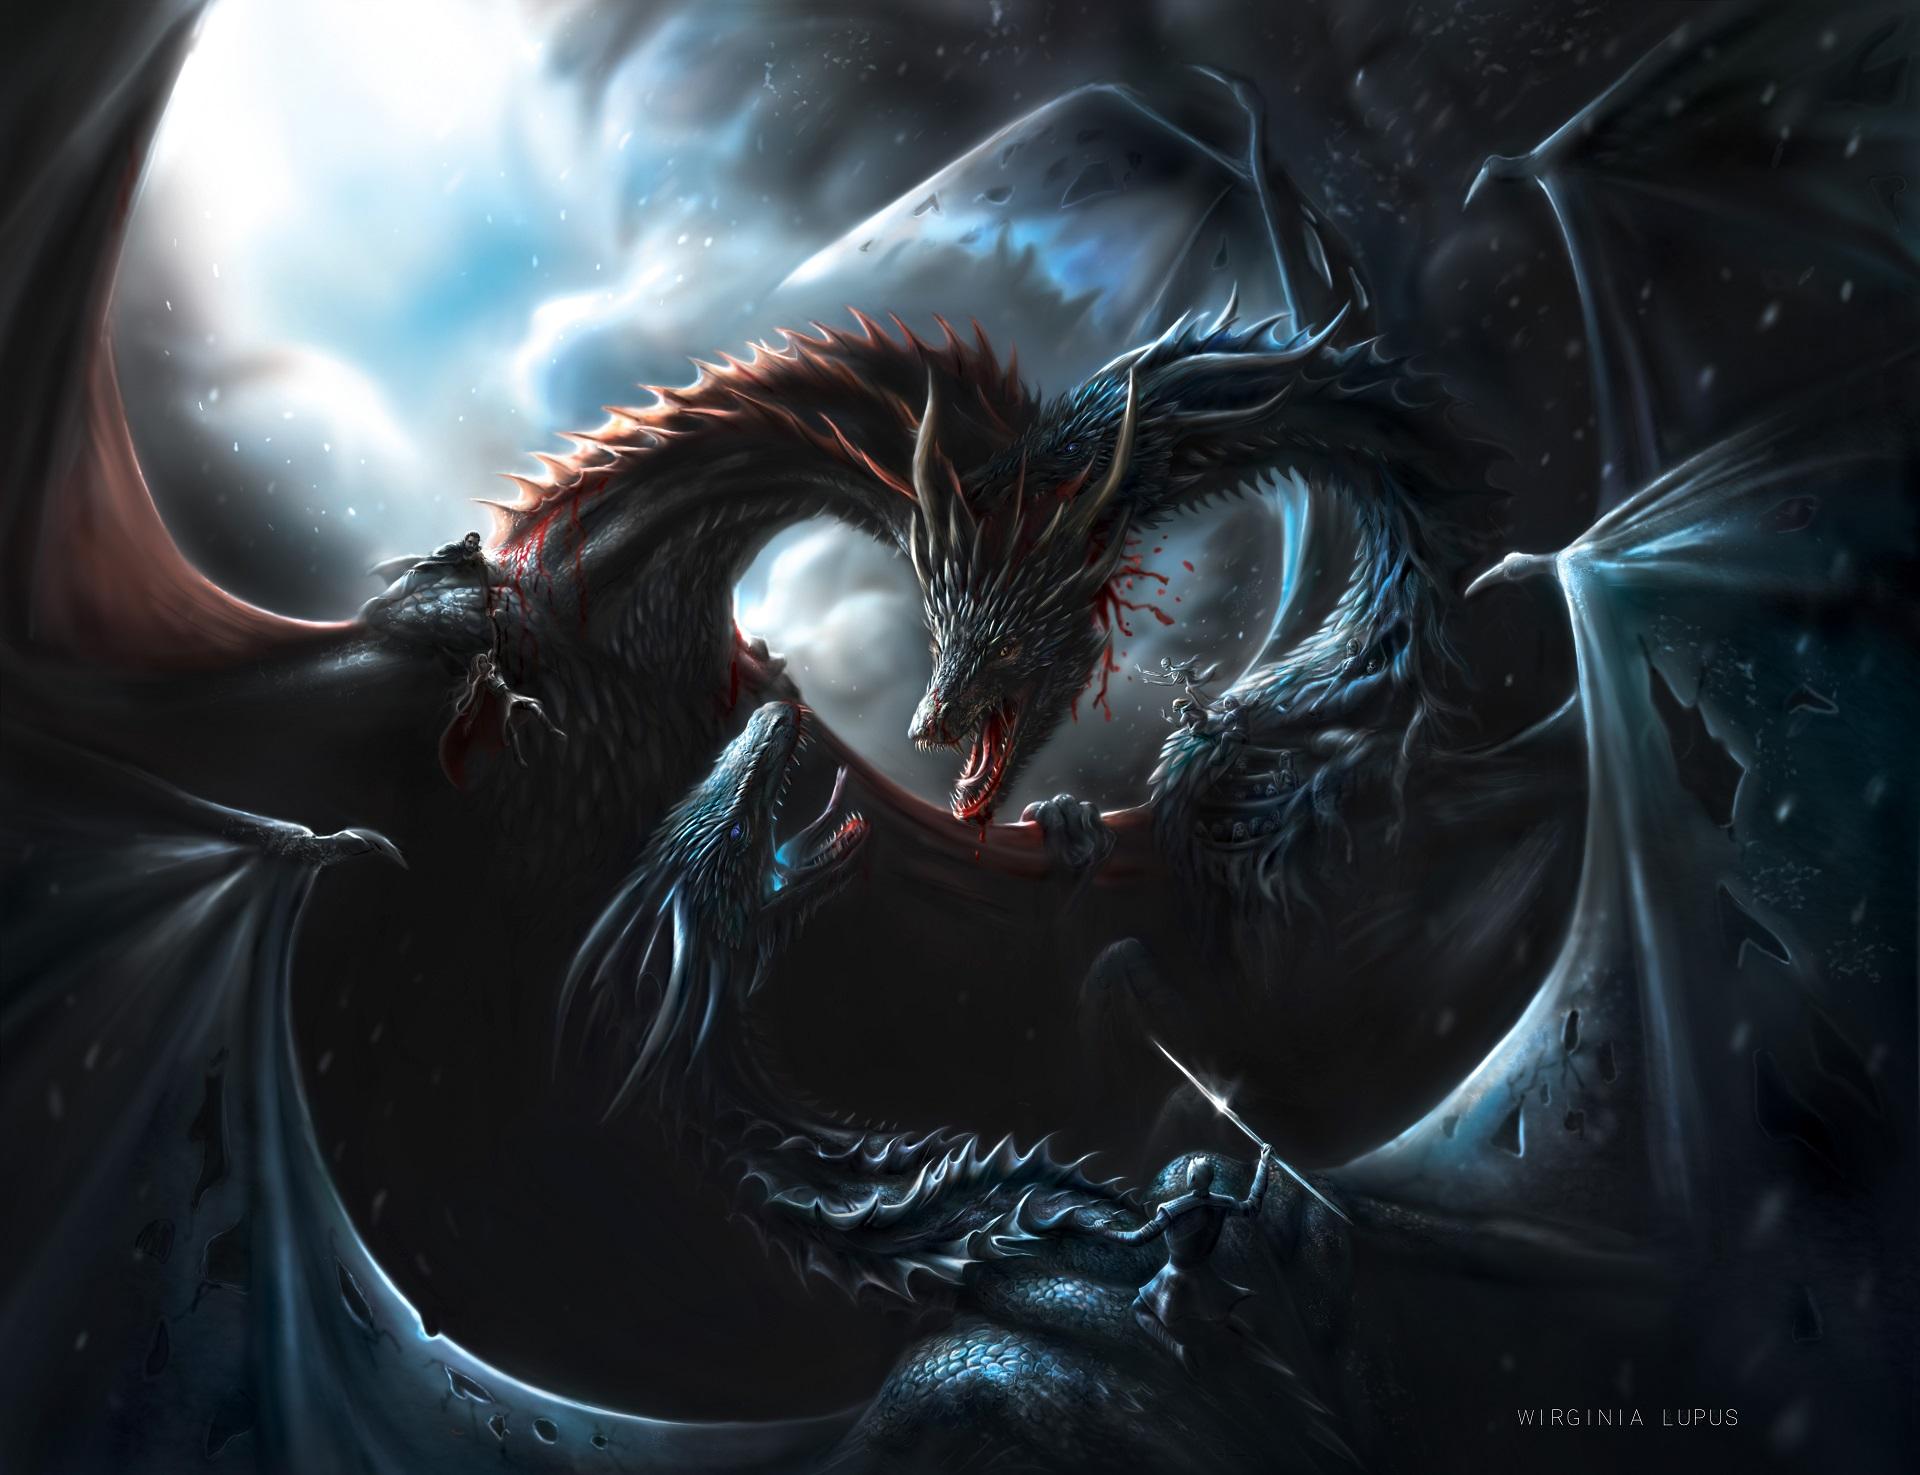 Wallpaper Artwork Fantasy Art Dragon Game Of Thrones The Night